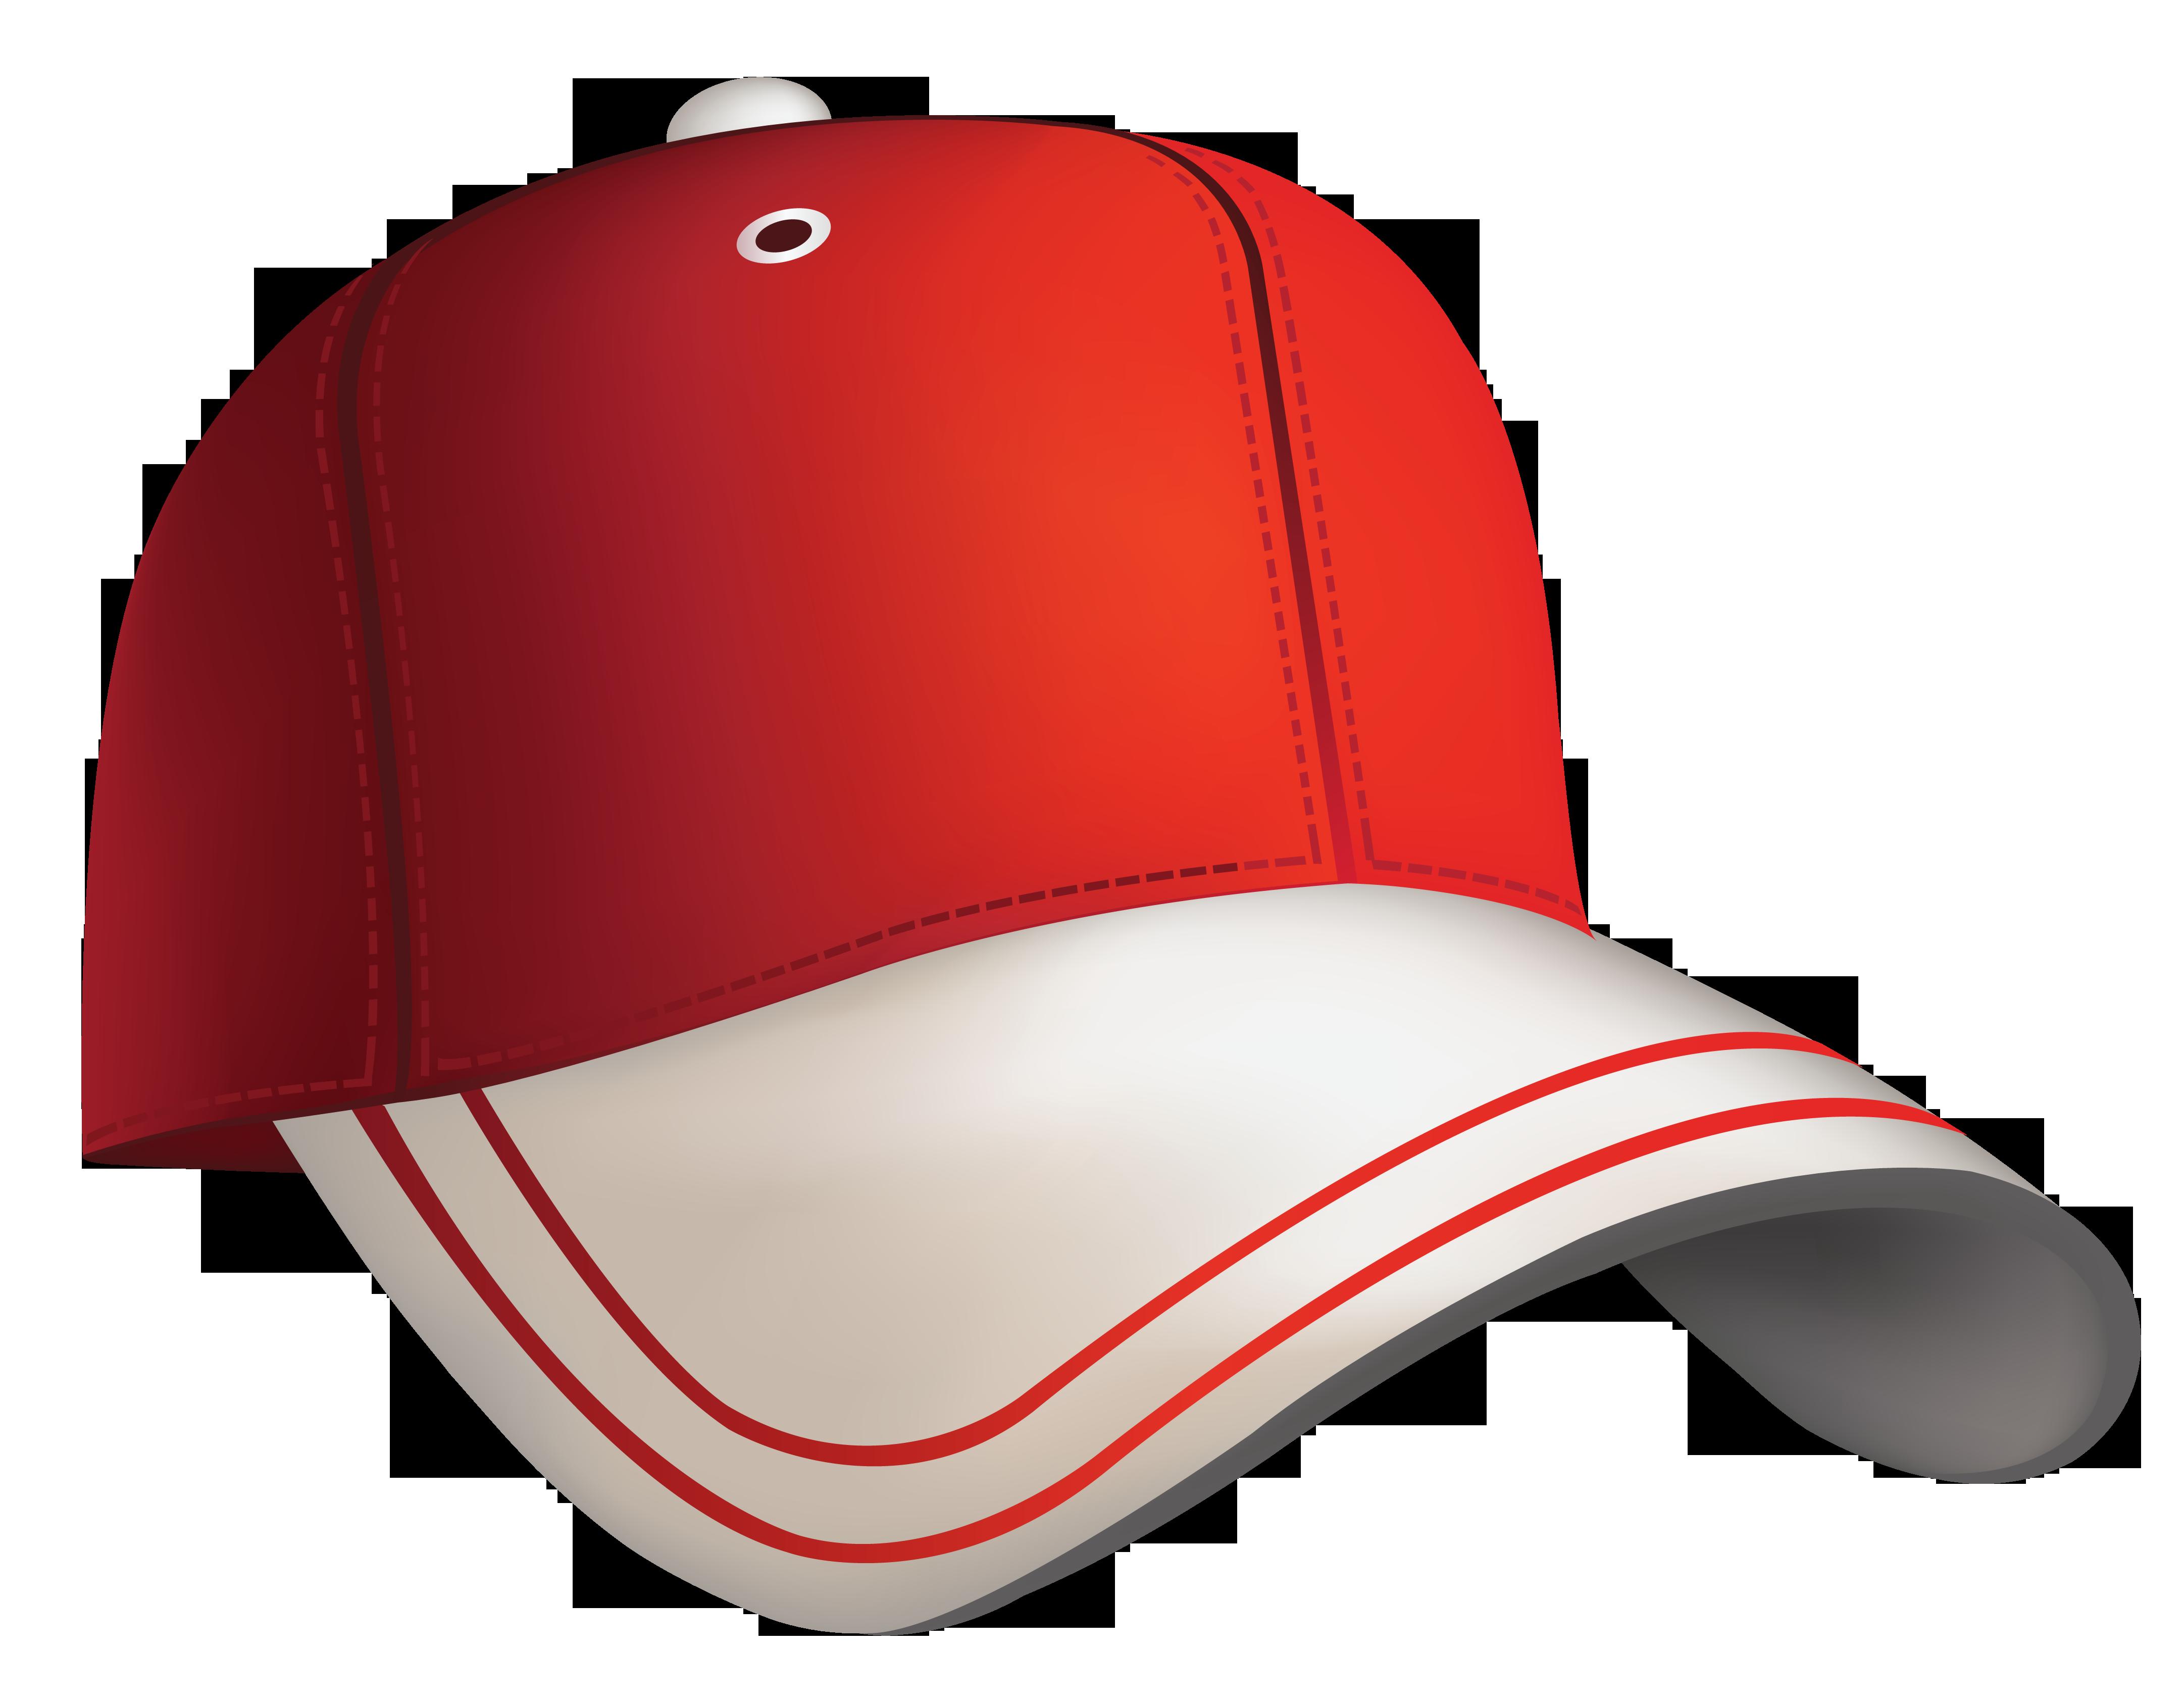 Clip Art Baseball Hat Clipart baseball cap clipart kid red clipart